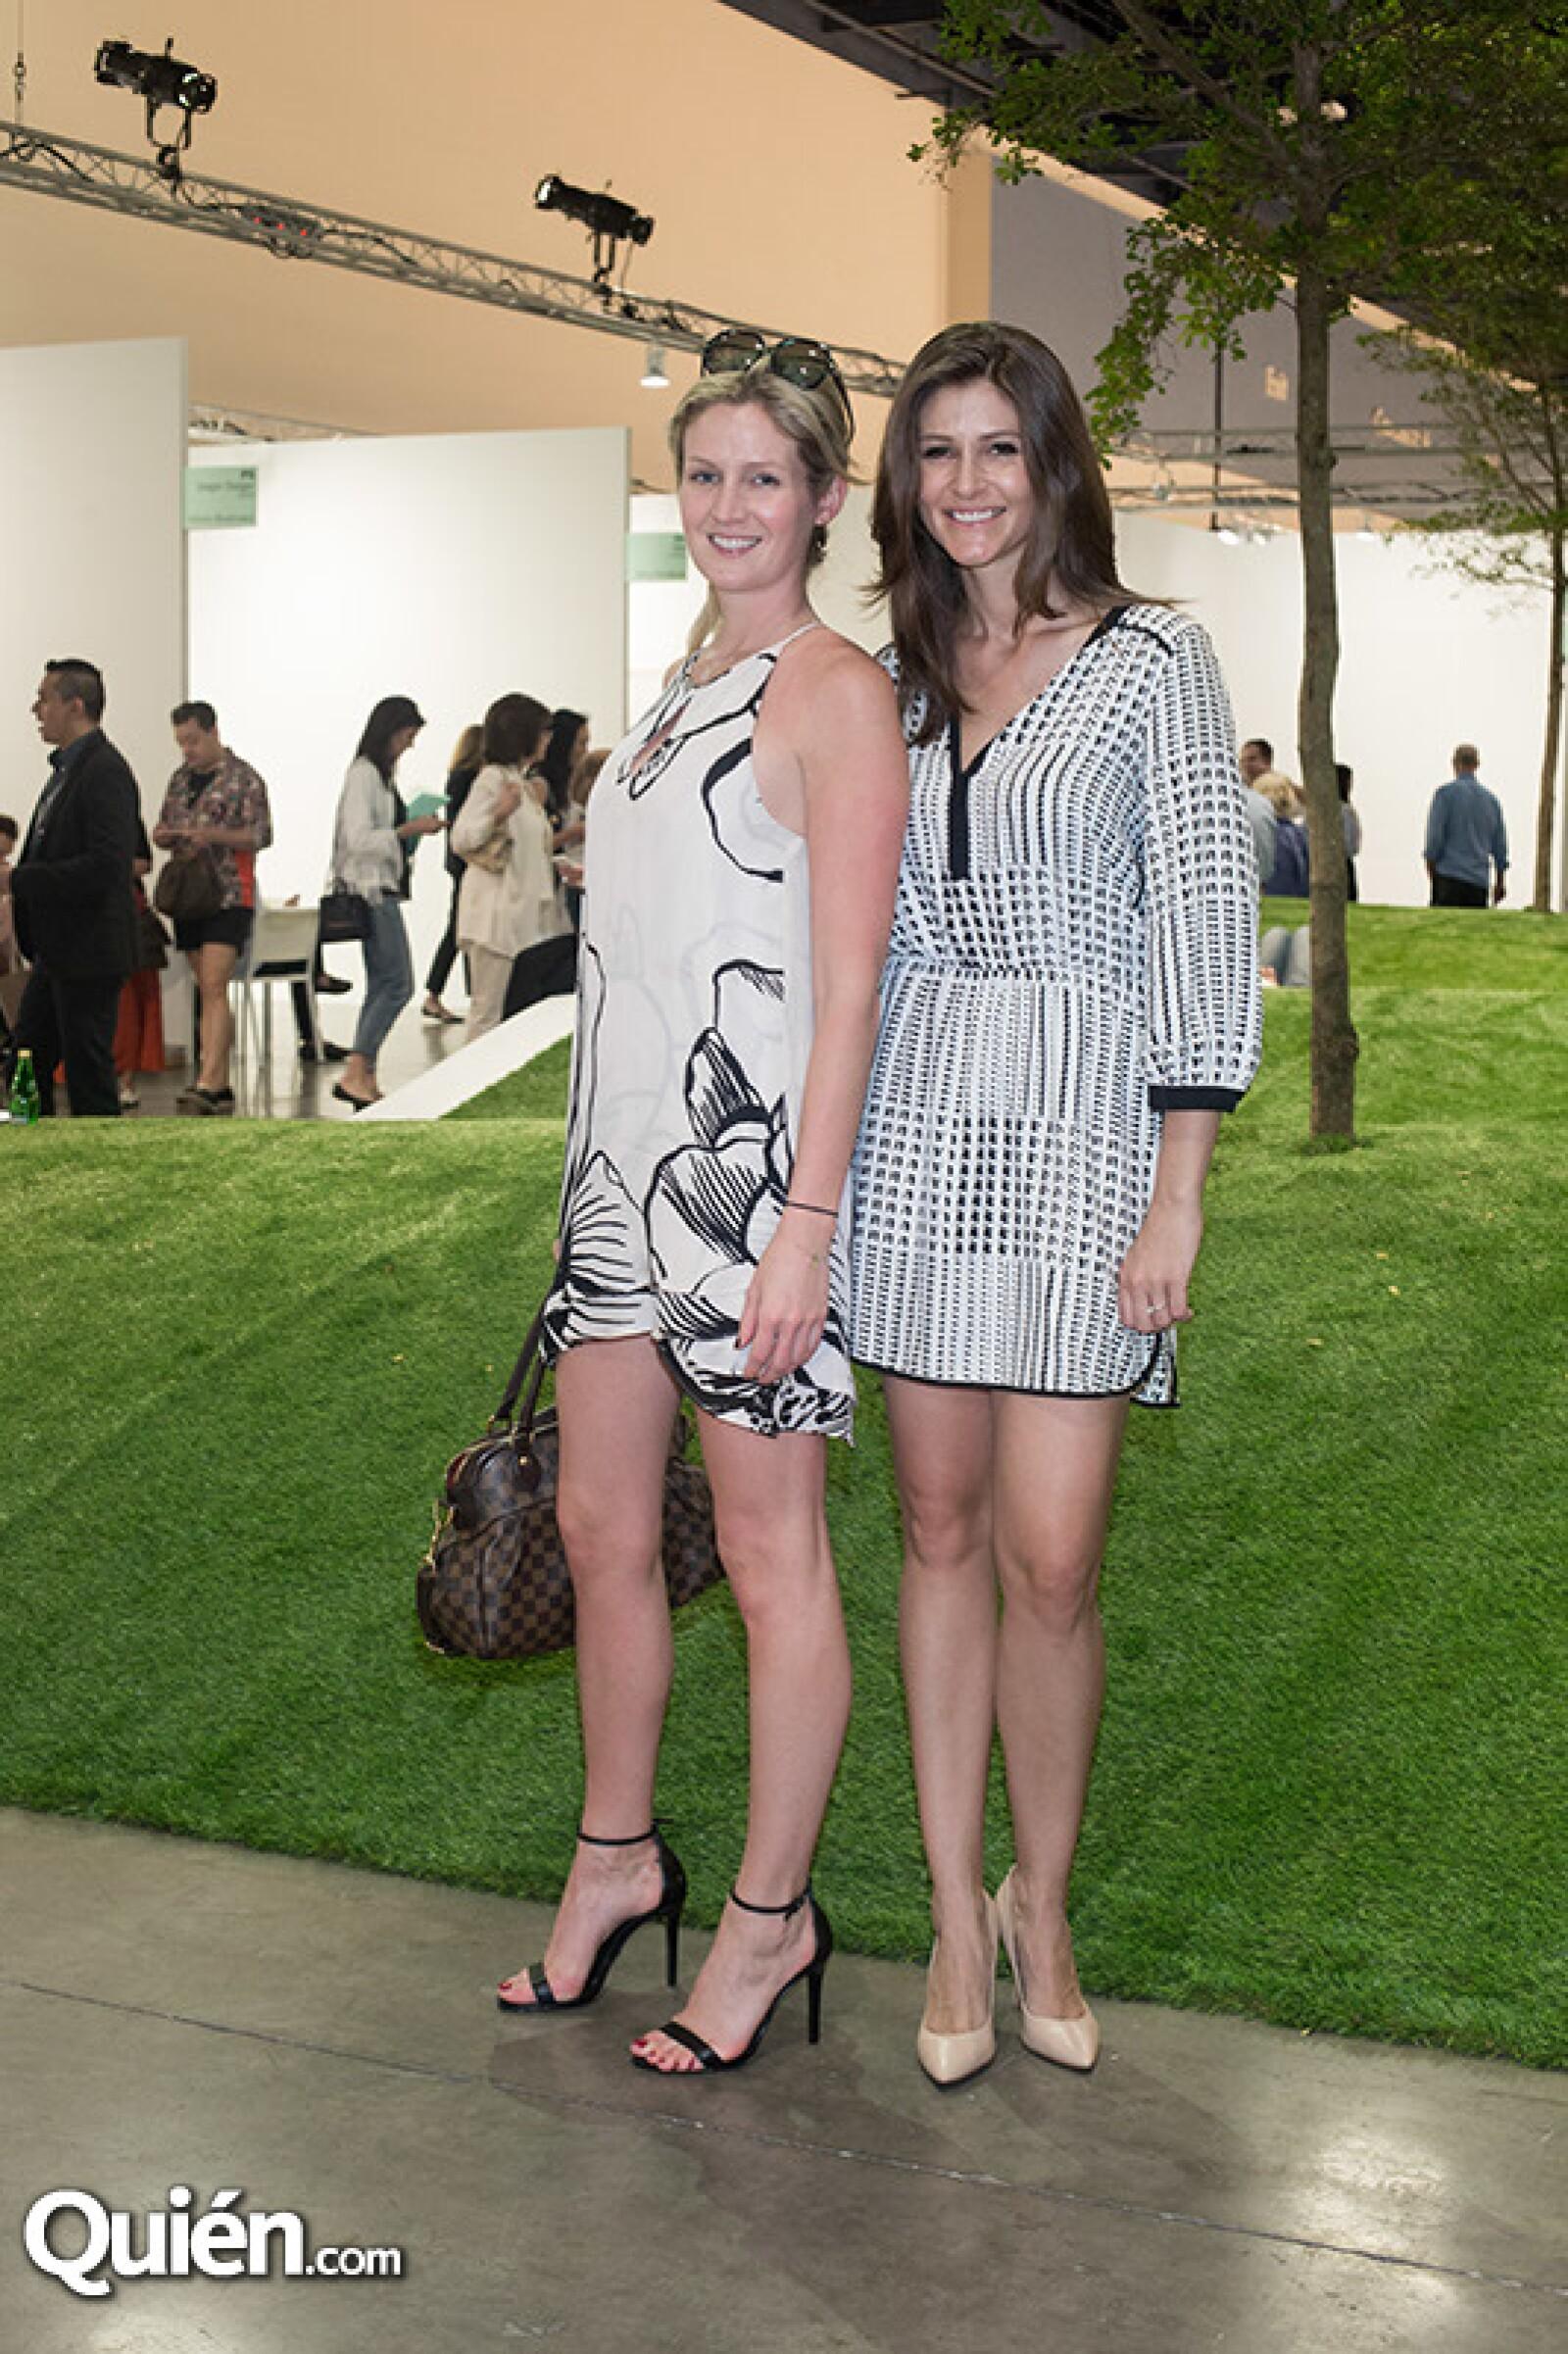 Sara Jensen y Courtney Smith